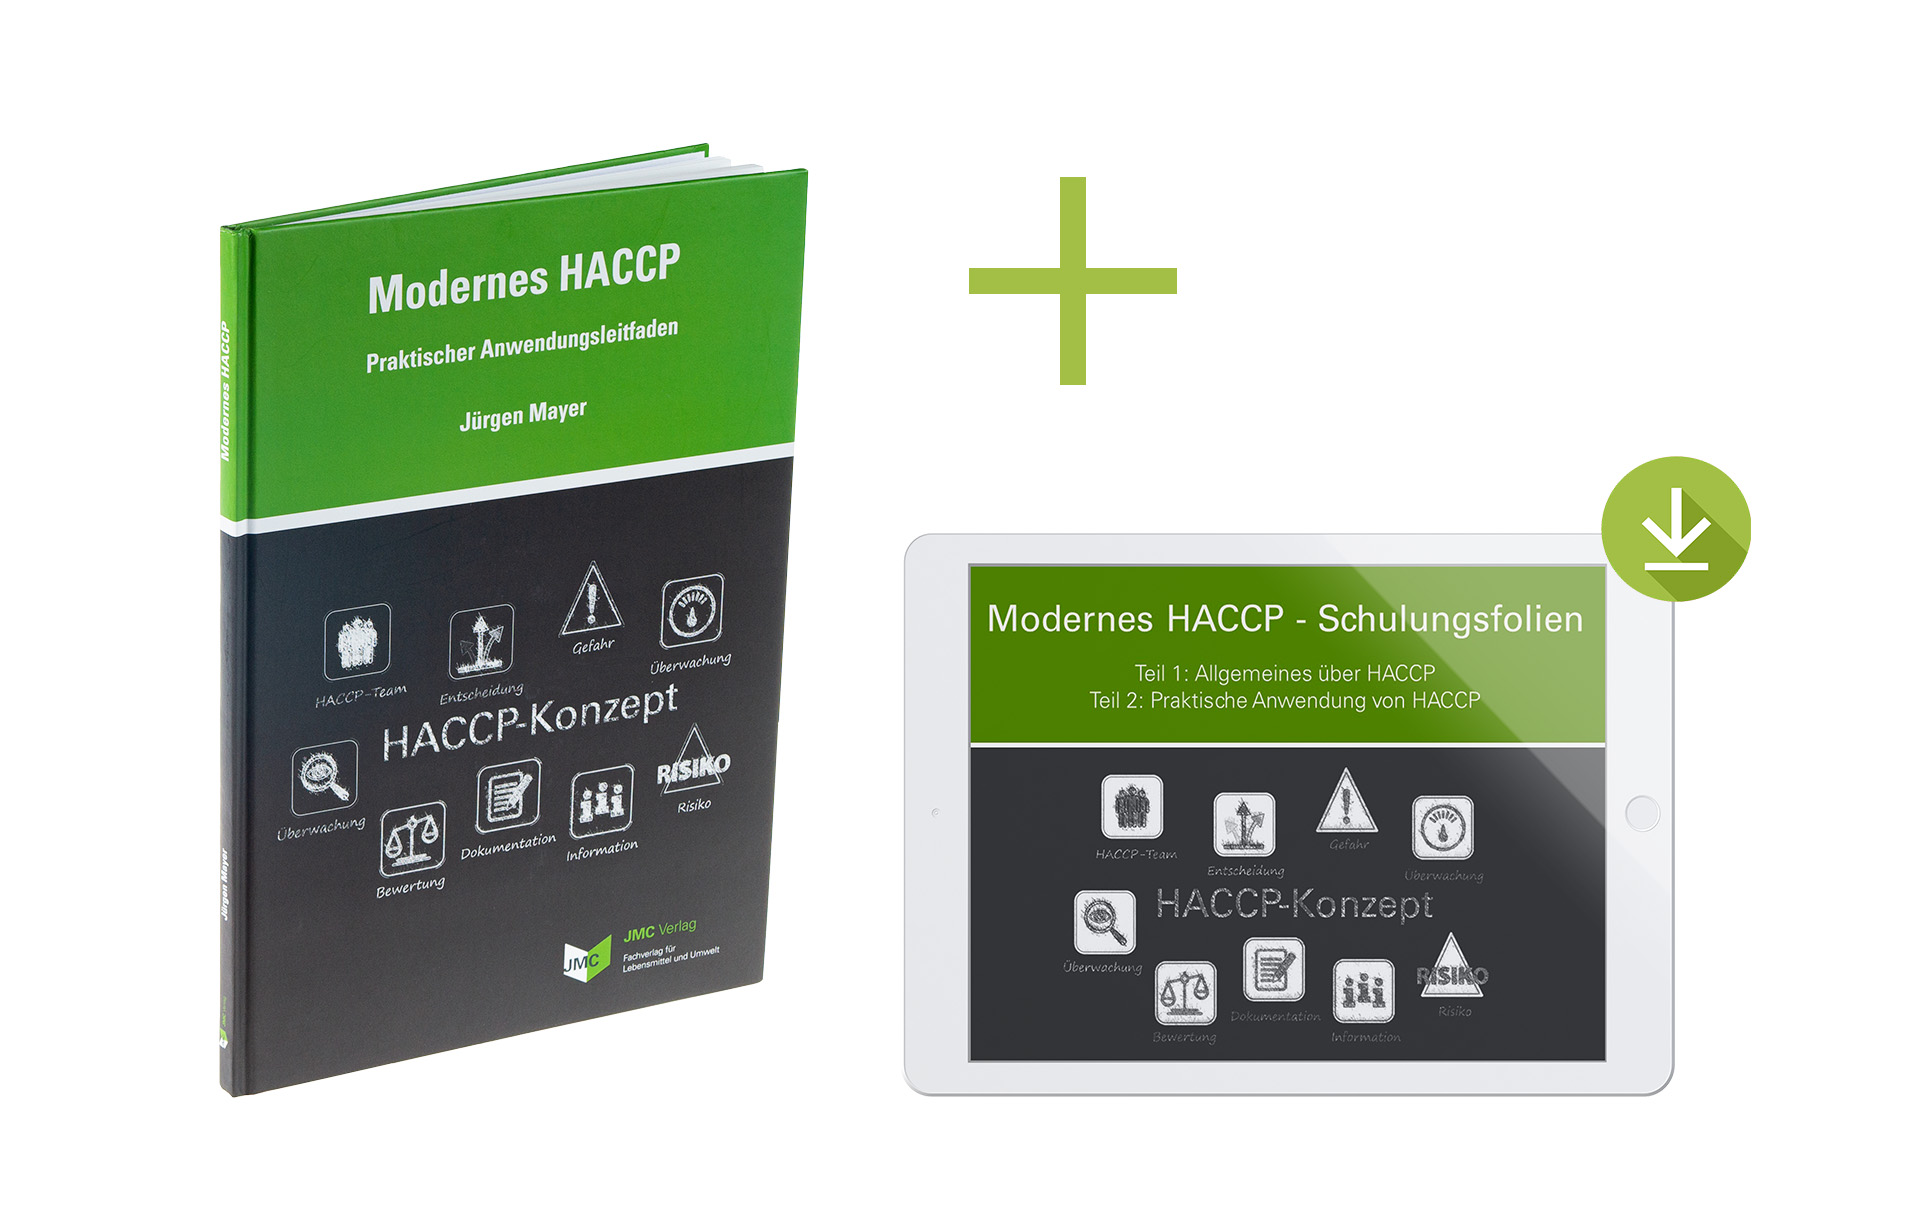 Modernes HACCP plus Schulungsfolien